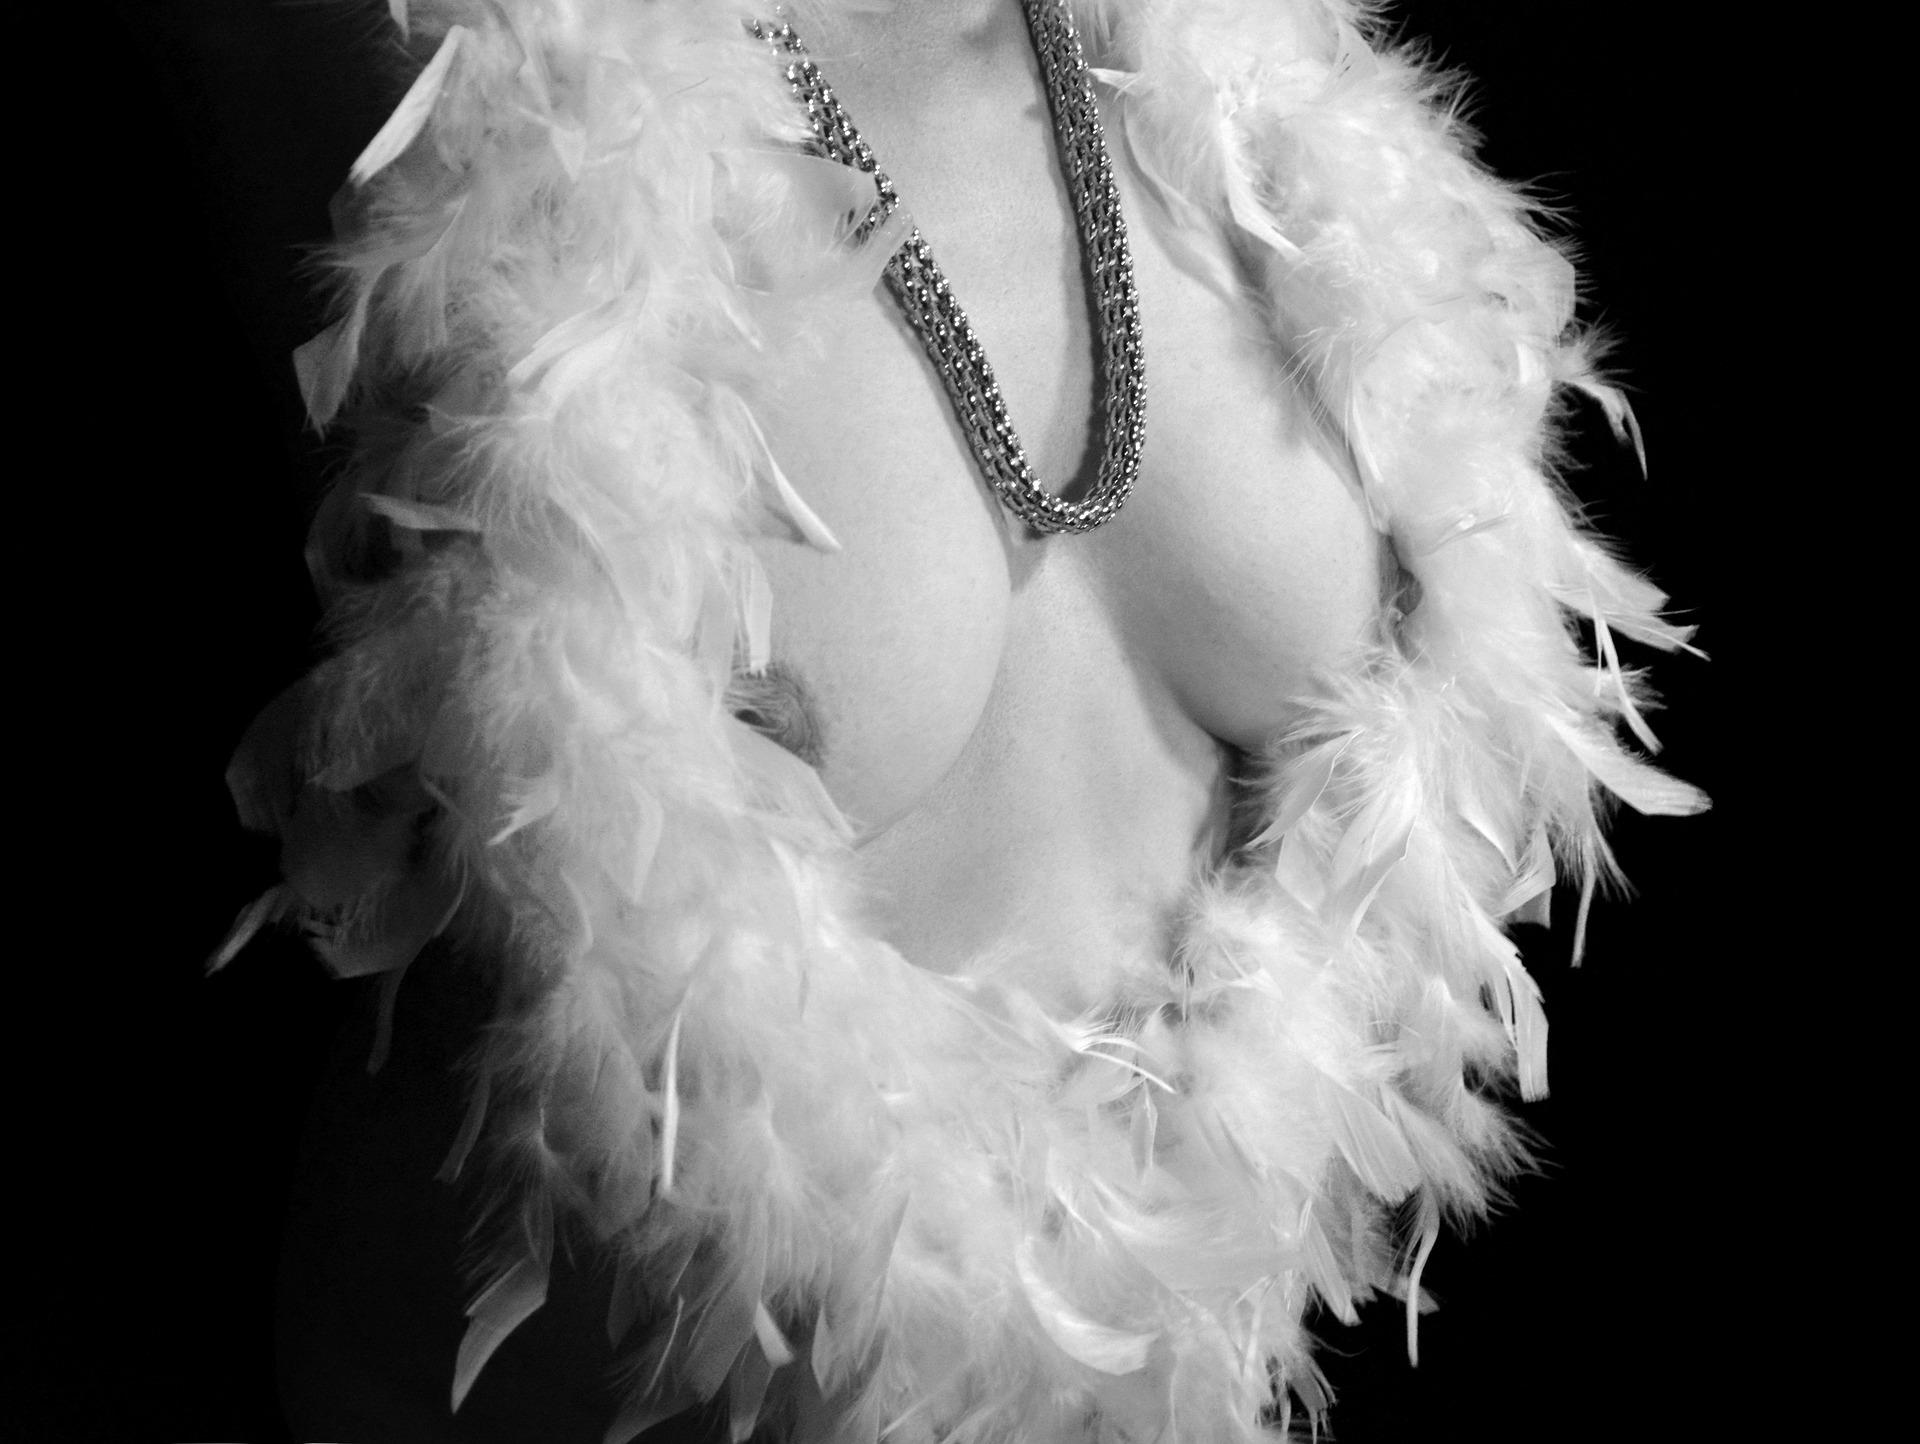 burlesque - All about Nippel – Schönheitstrends um die Brustwarze